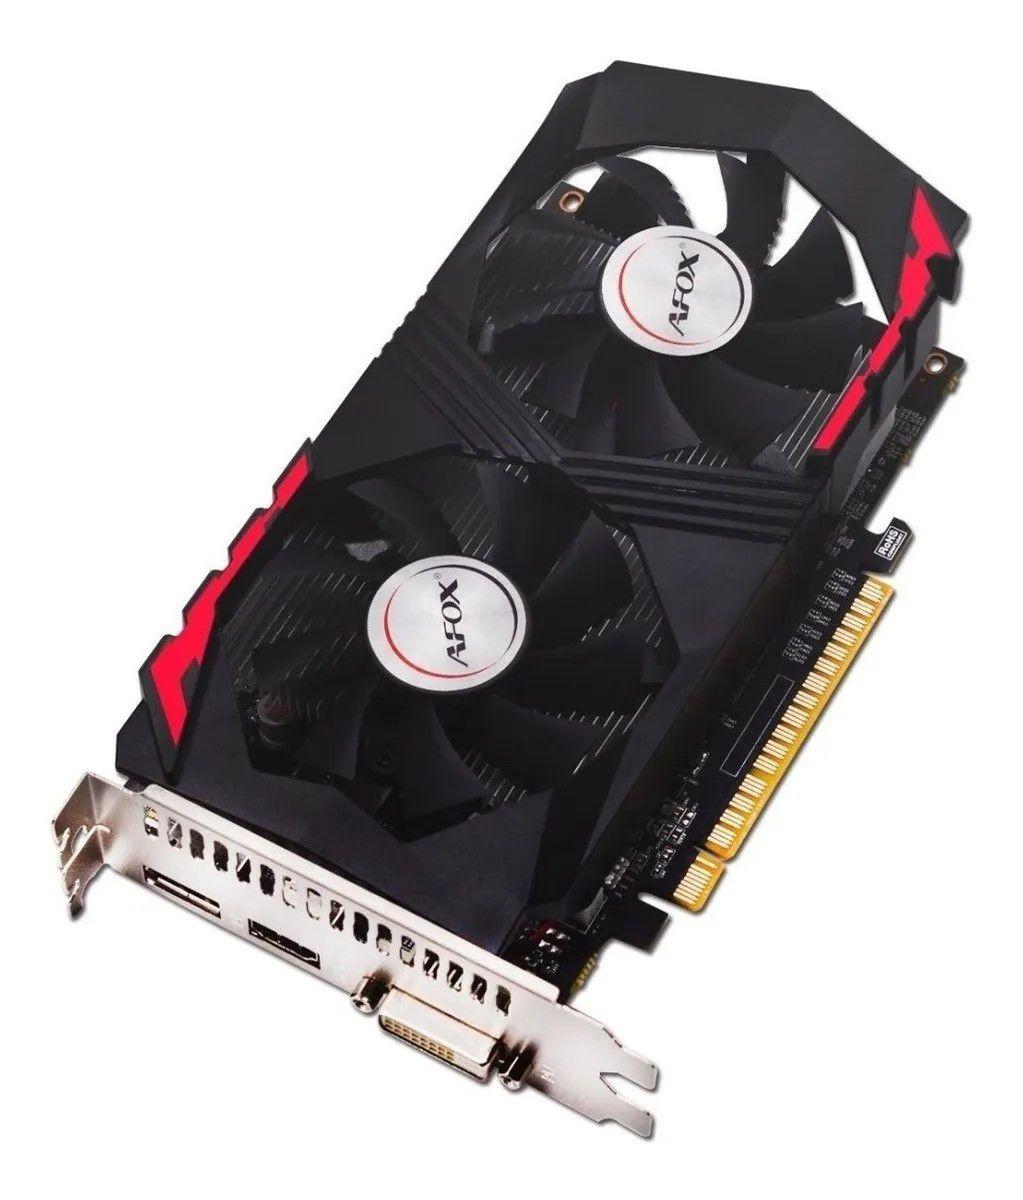 PLACA DE VIDEO 4GB DDR5 128BIT GTX-1050TI DP/HDMI/DVI AFOX  - Express Informática